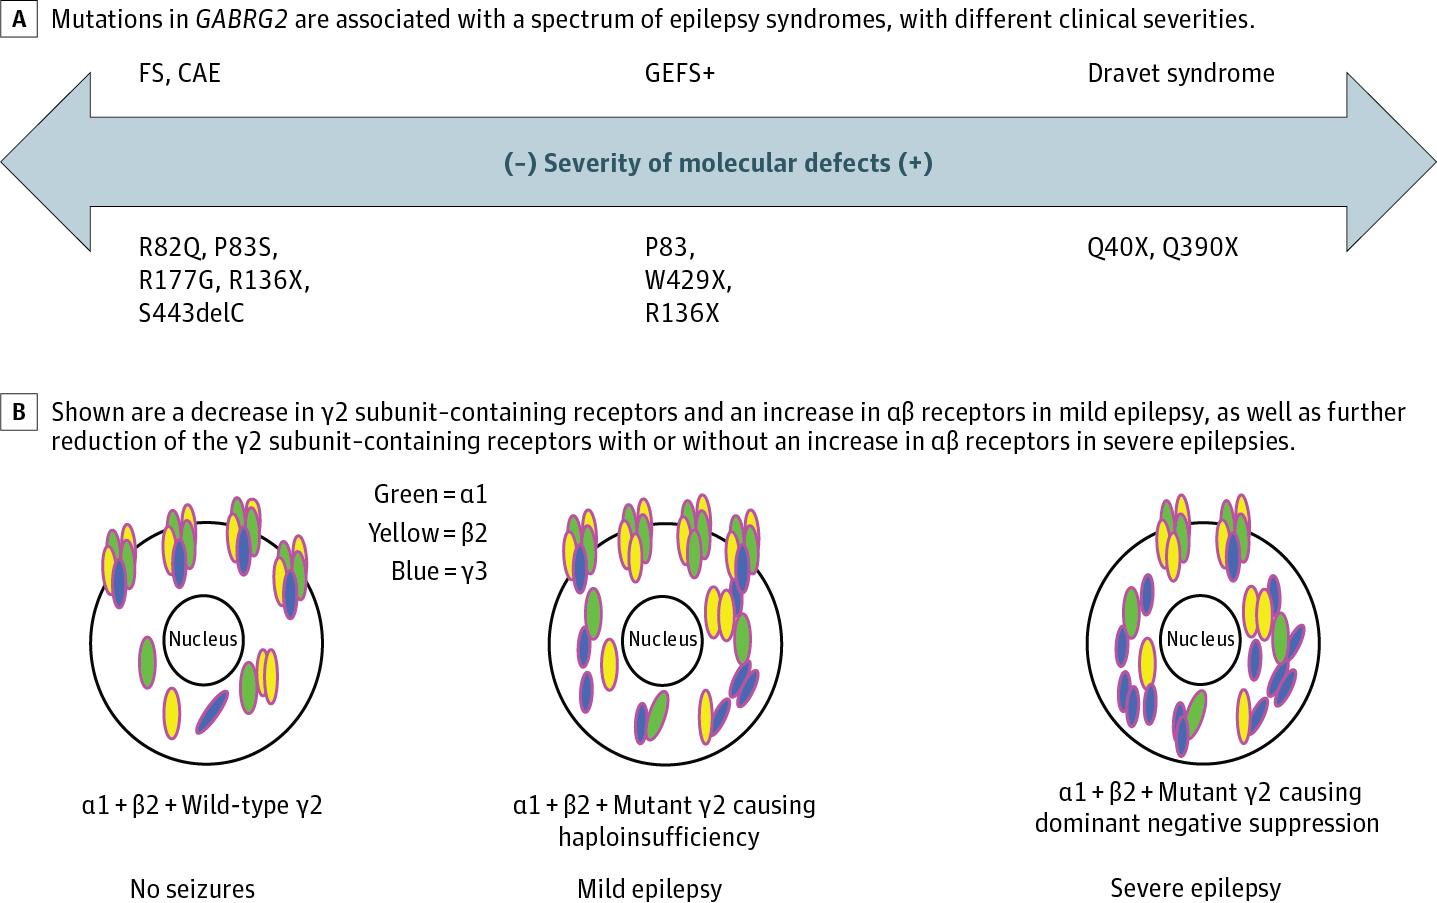 Molecular Pathogenic Basis for GABRG2 Mutations Associated With a ...